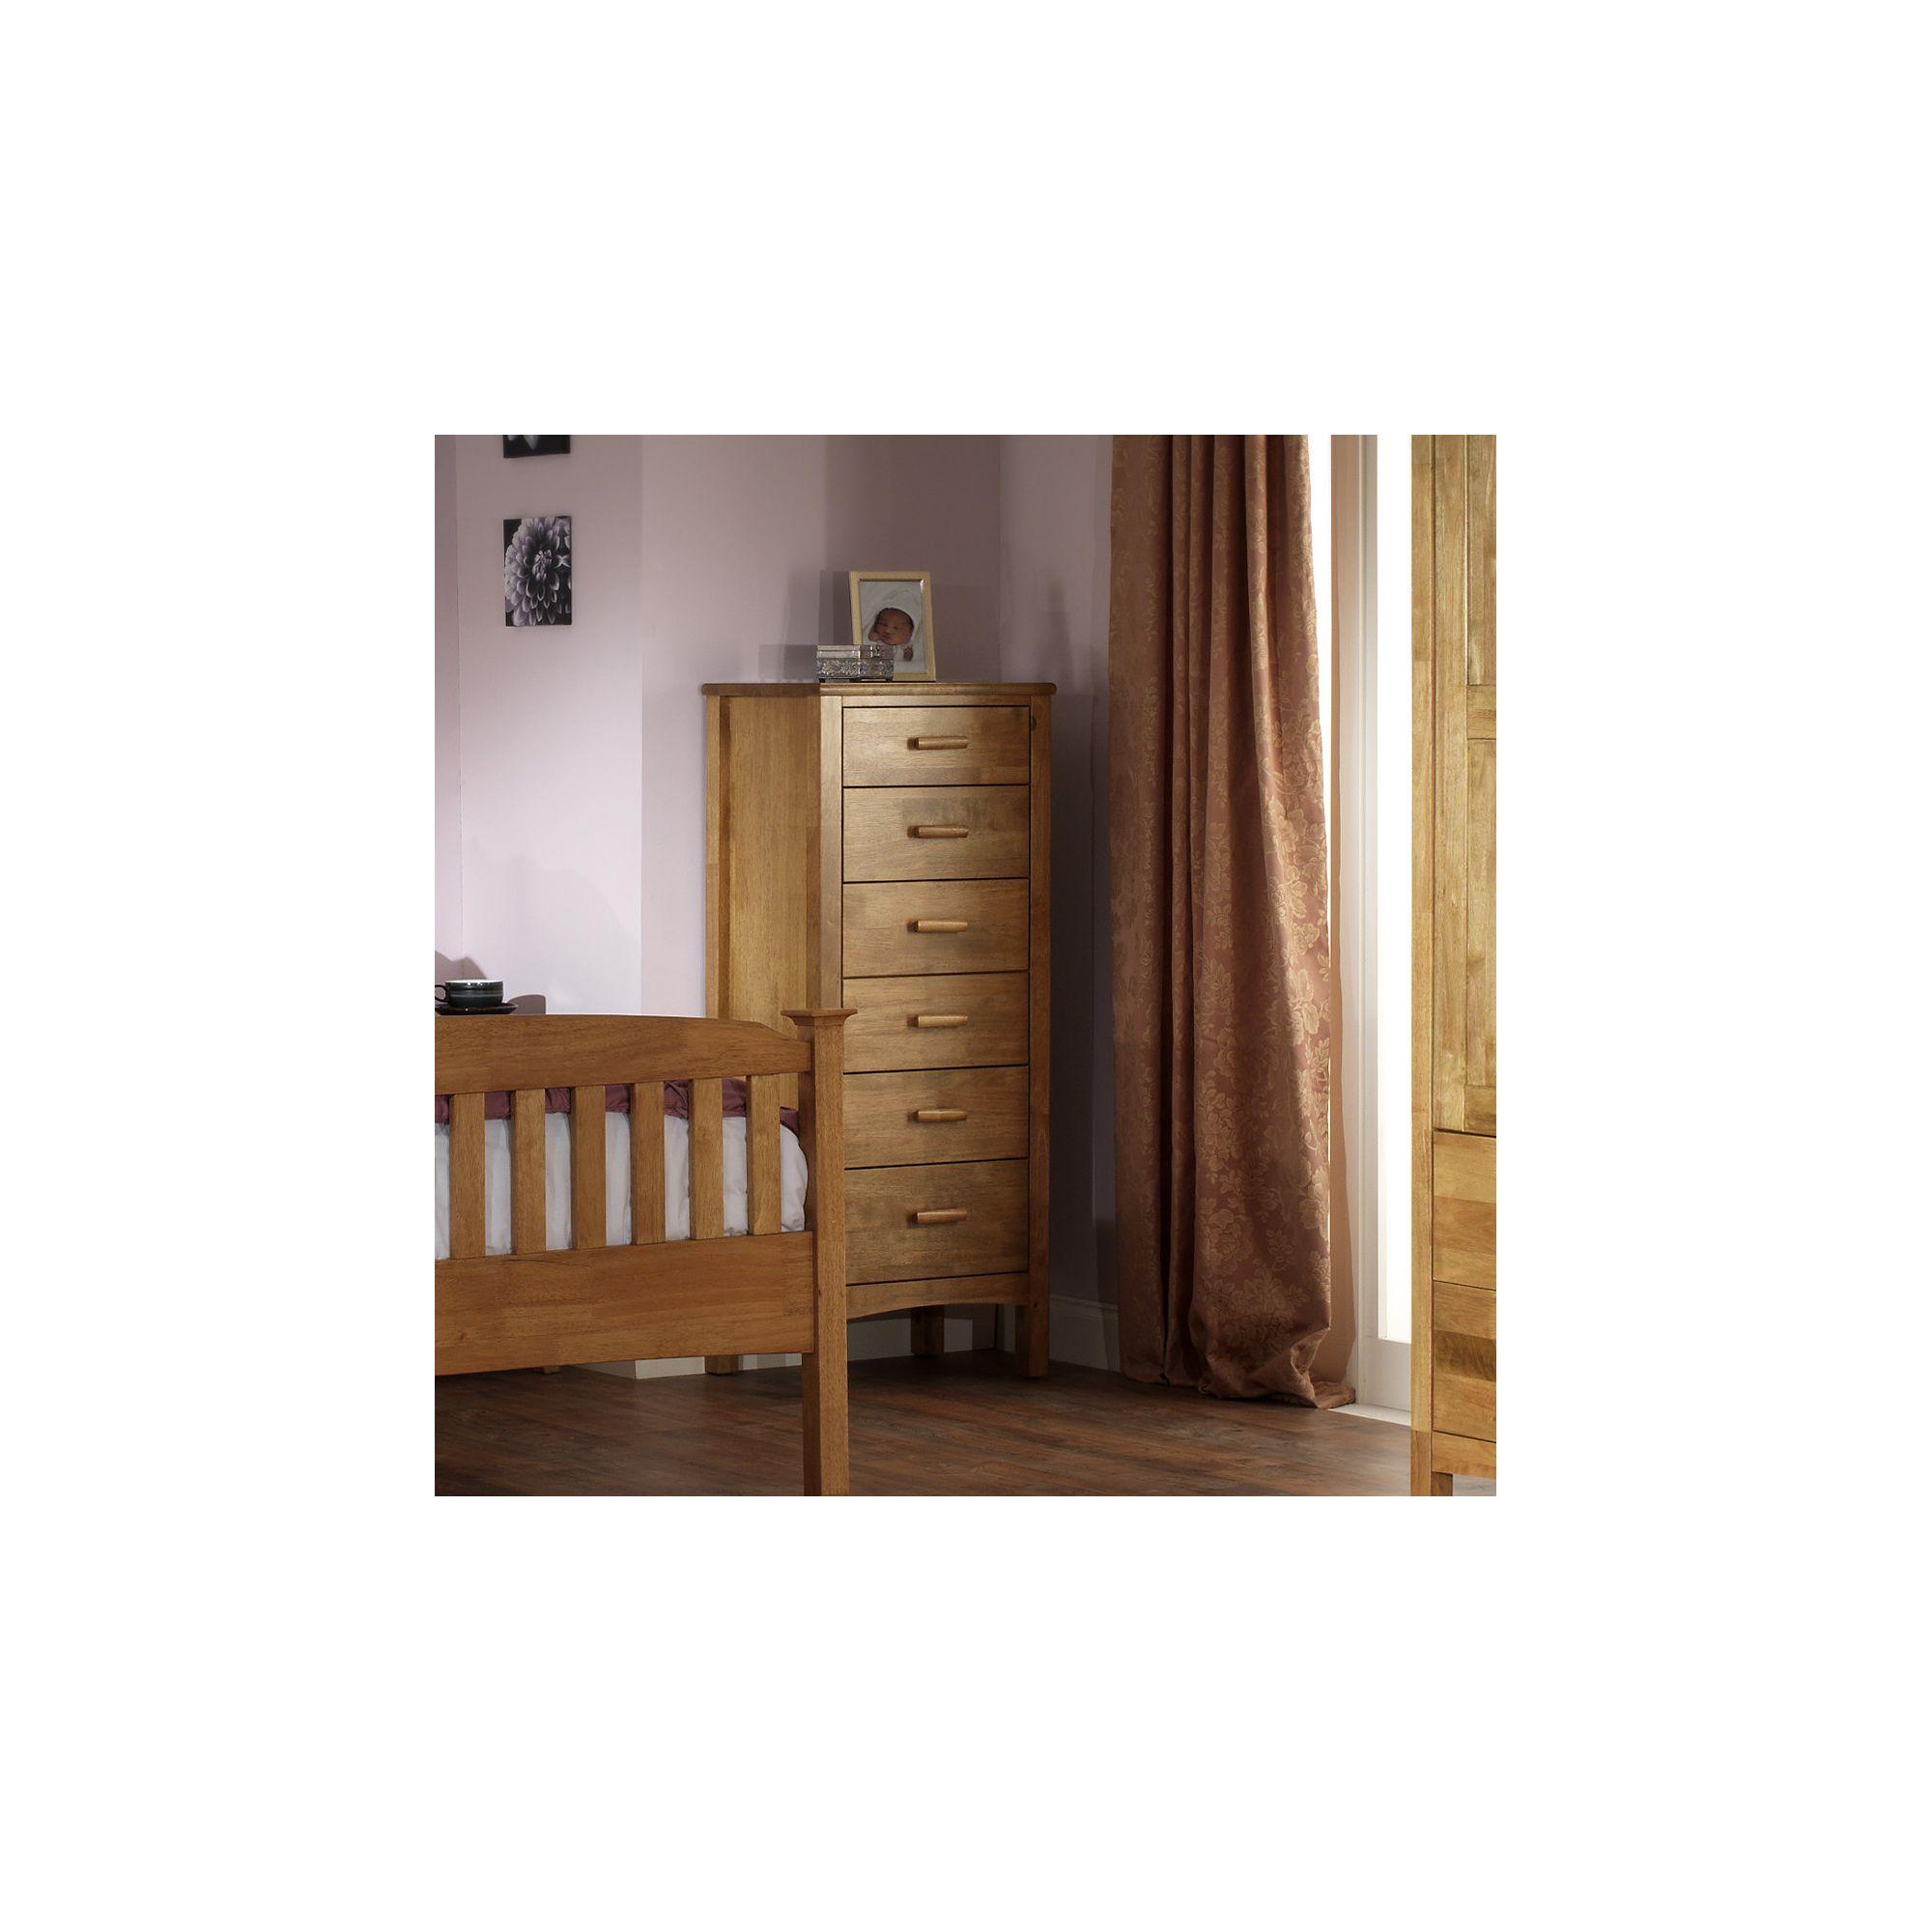 Serene Furnishings Eleanor 6 Drawer Wellington Tallboy Chest - Honey Oak at Tescos Direct